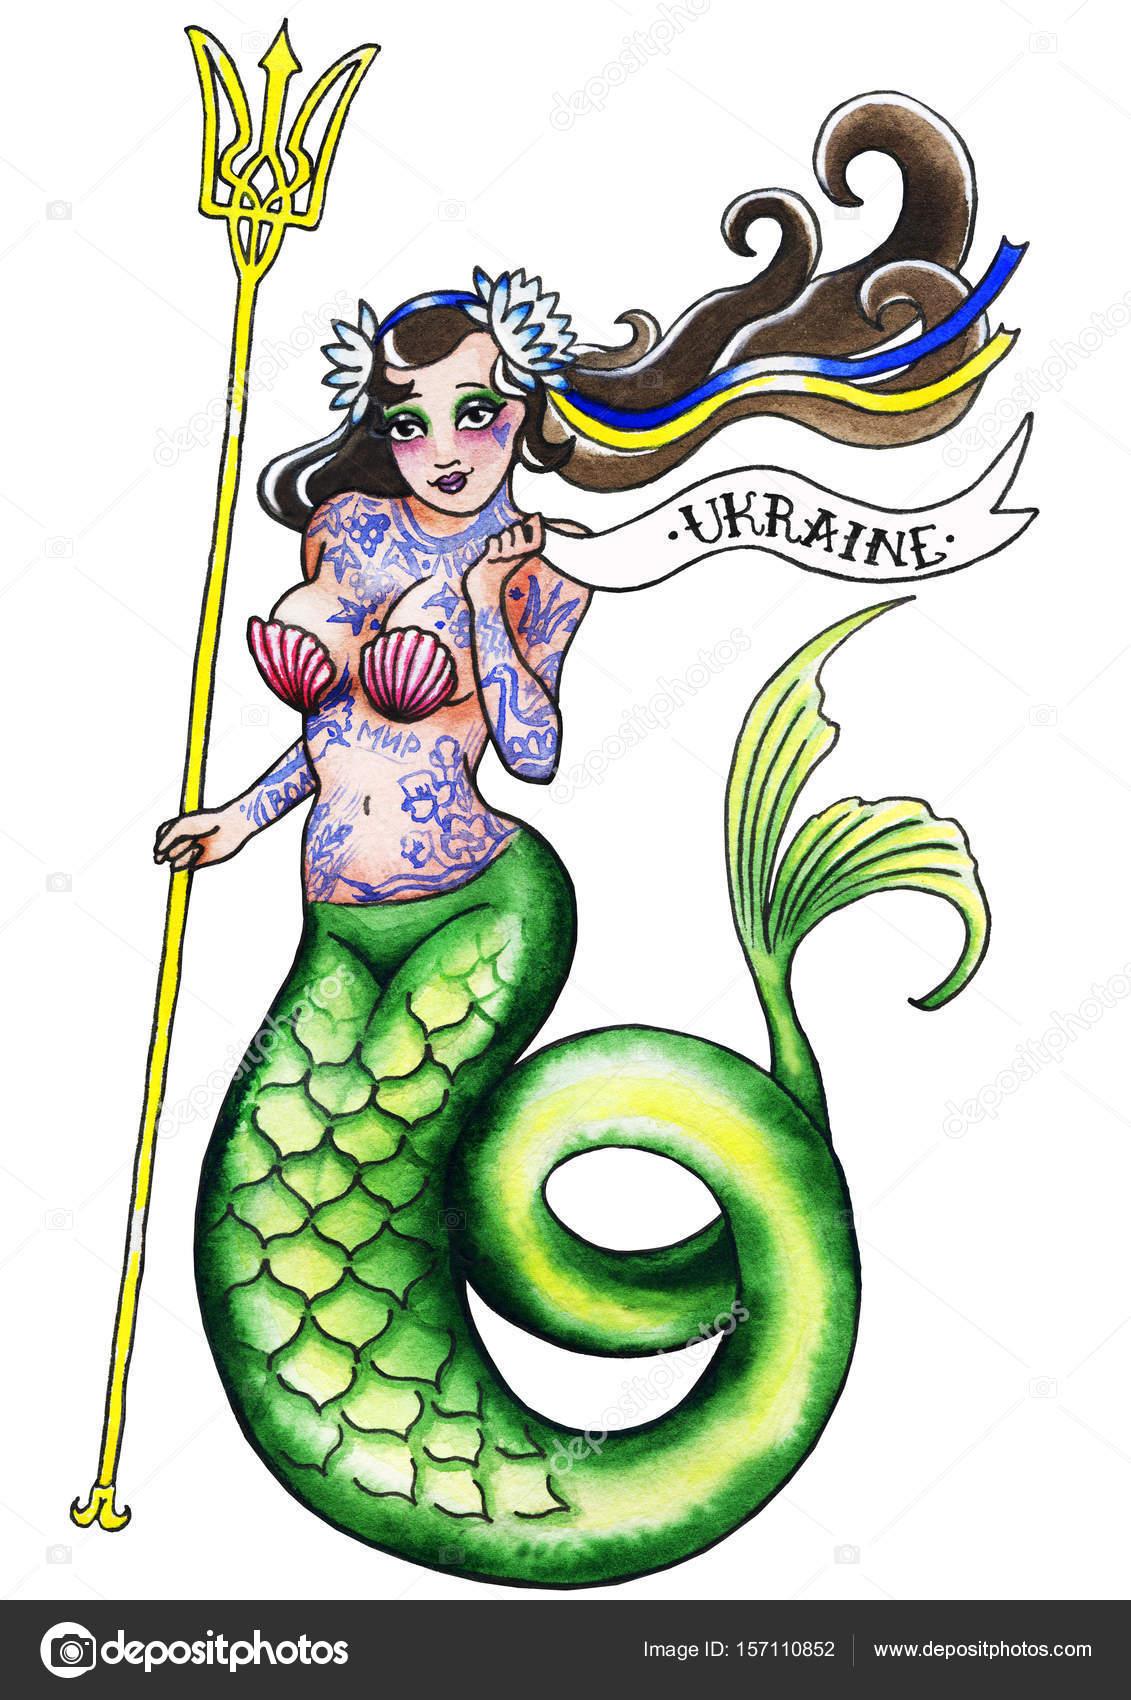 depositphotos_157110852-stock-photo-old-school-tattoo-of-mermaid.jpg